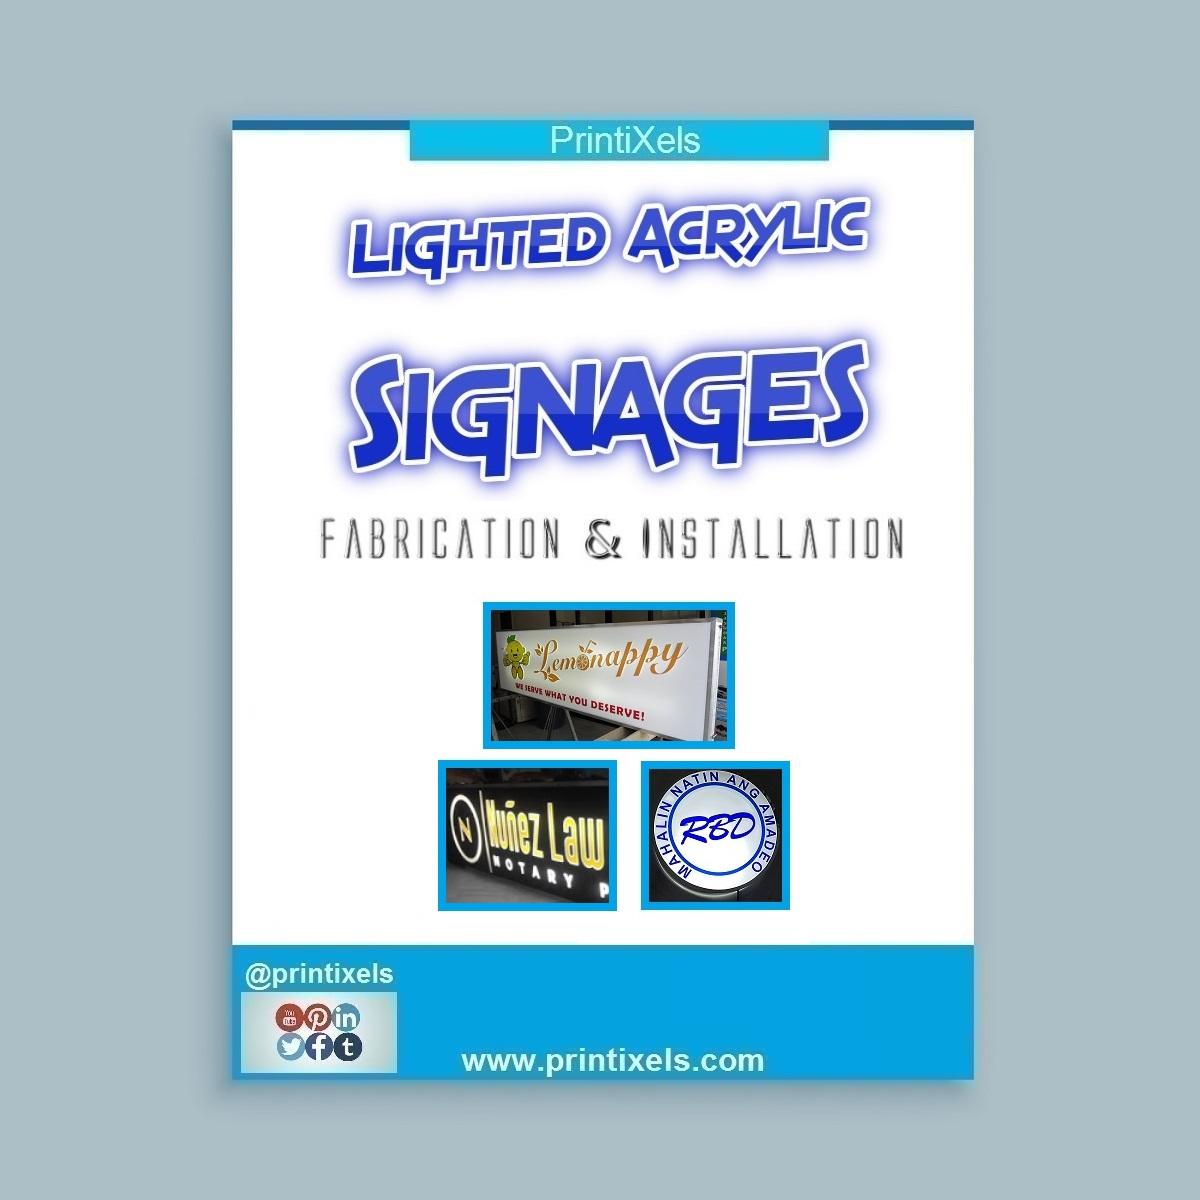 Lighted Acrylic Signages - Fabrication & Installation